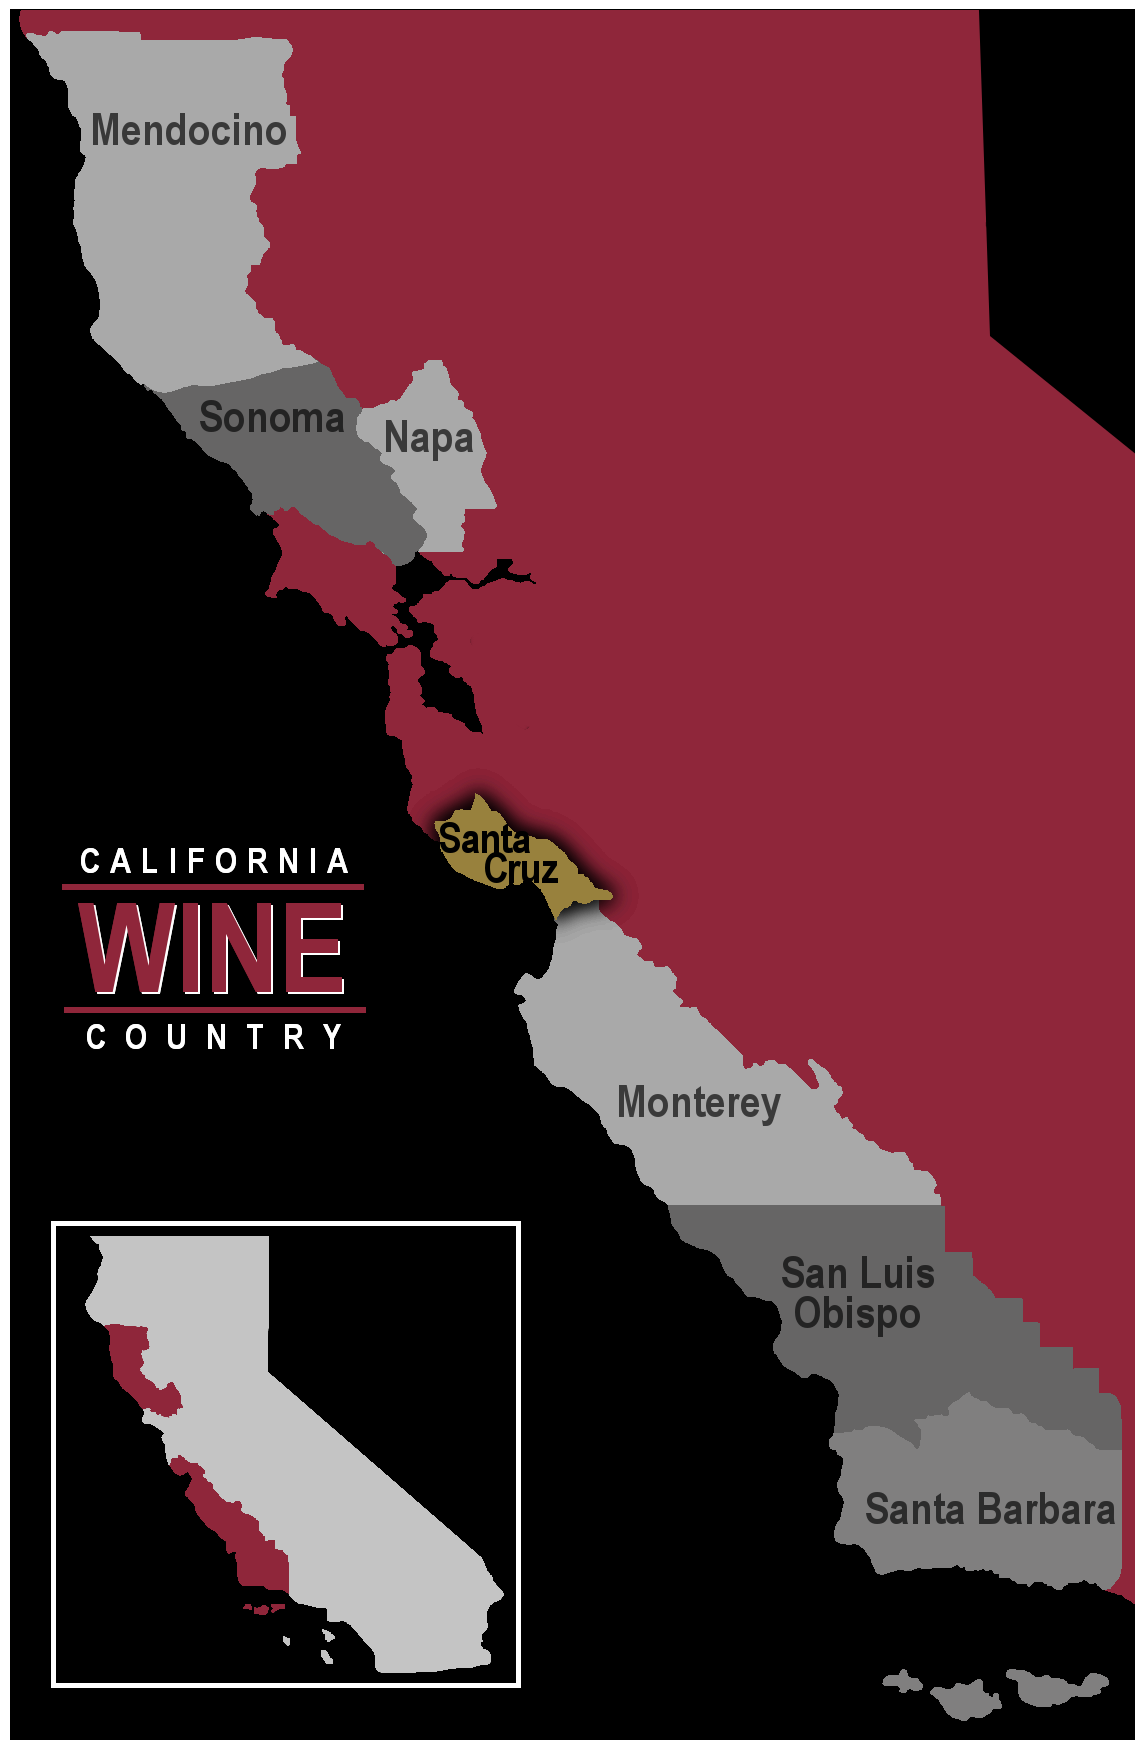 California wine region Santa Cruz